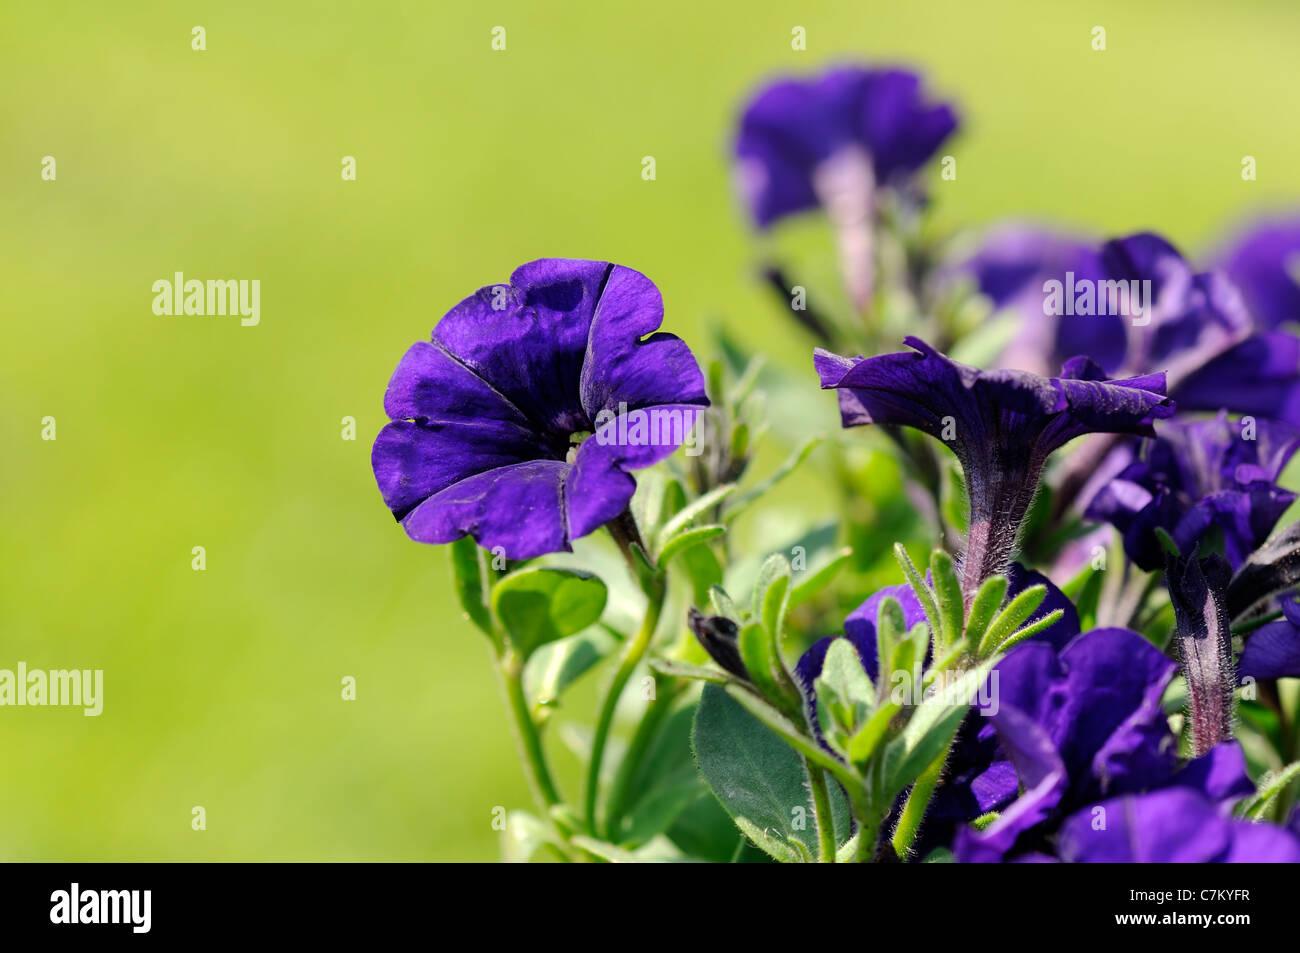 Close-up of a blue-purple colored petunias. - Stock Image